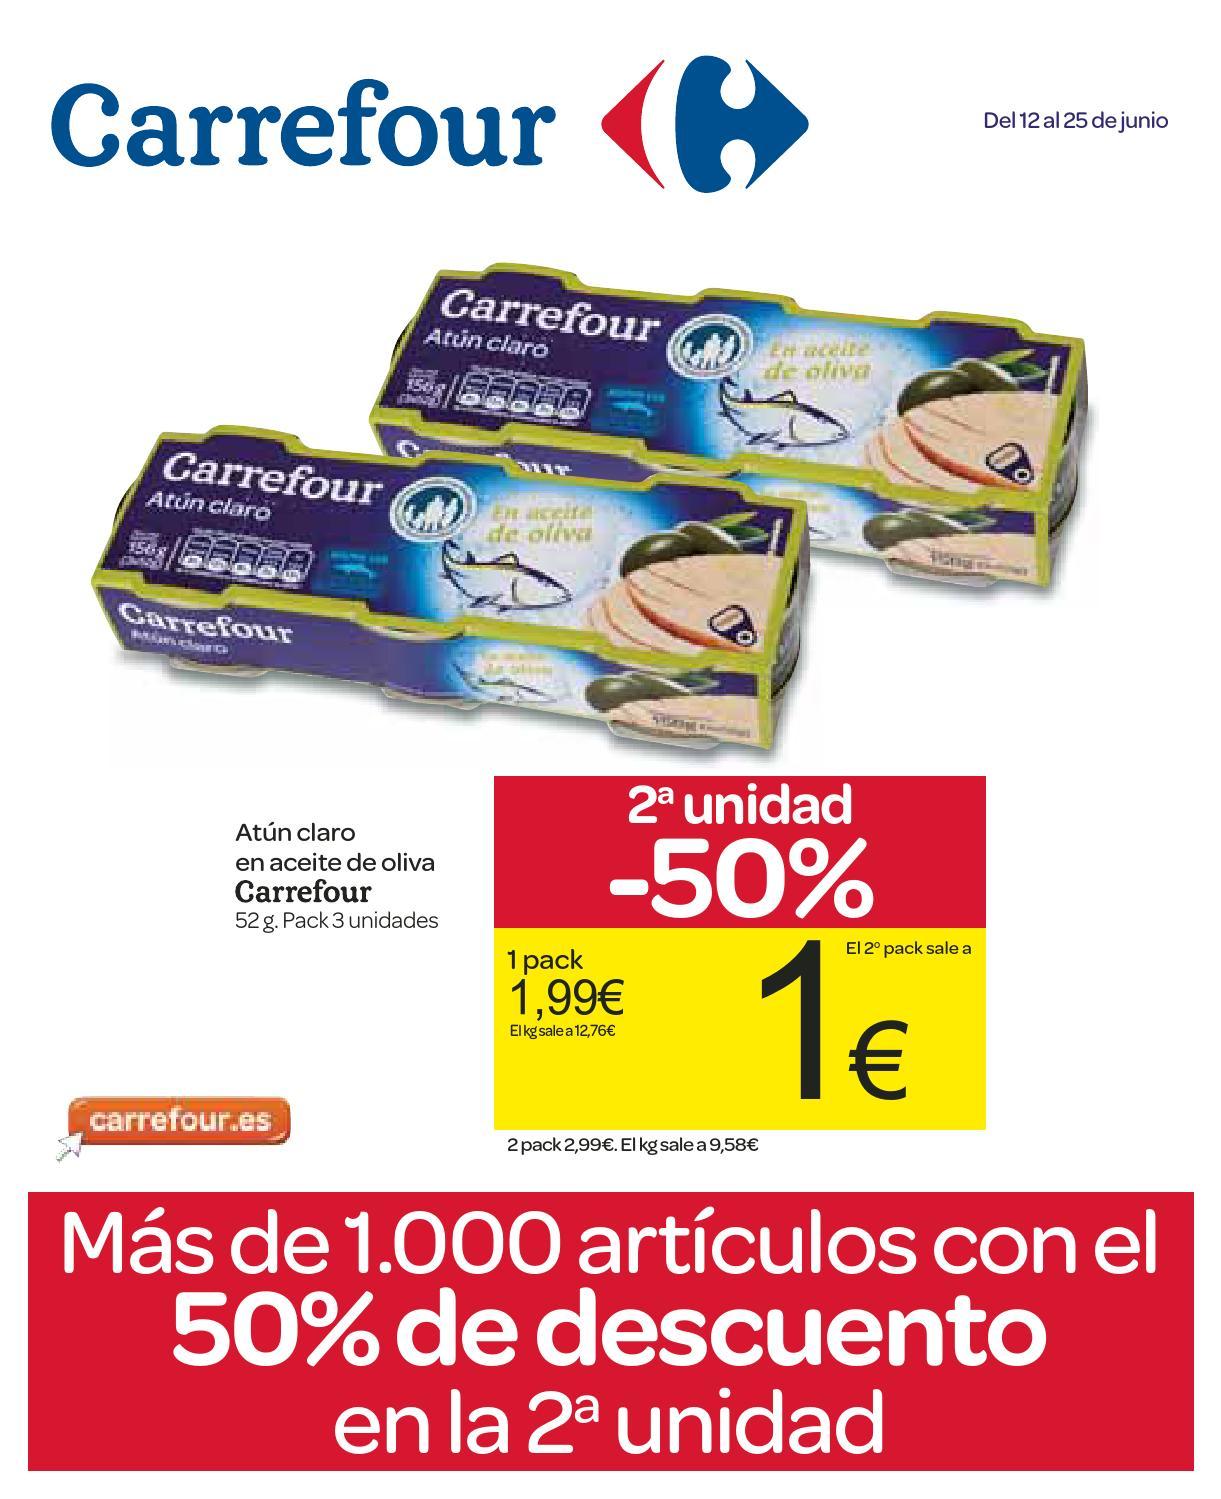 Carrefour Catalogo Junio 2013 By Milyuncatalogos Com Issuu ~ Pinzas Sujeta Sabanas Carrefour